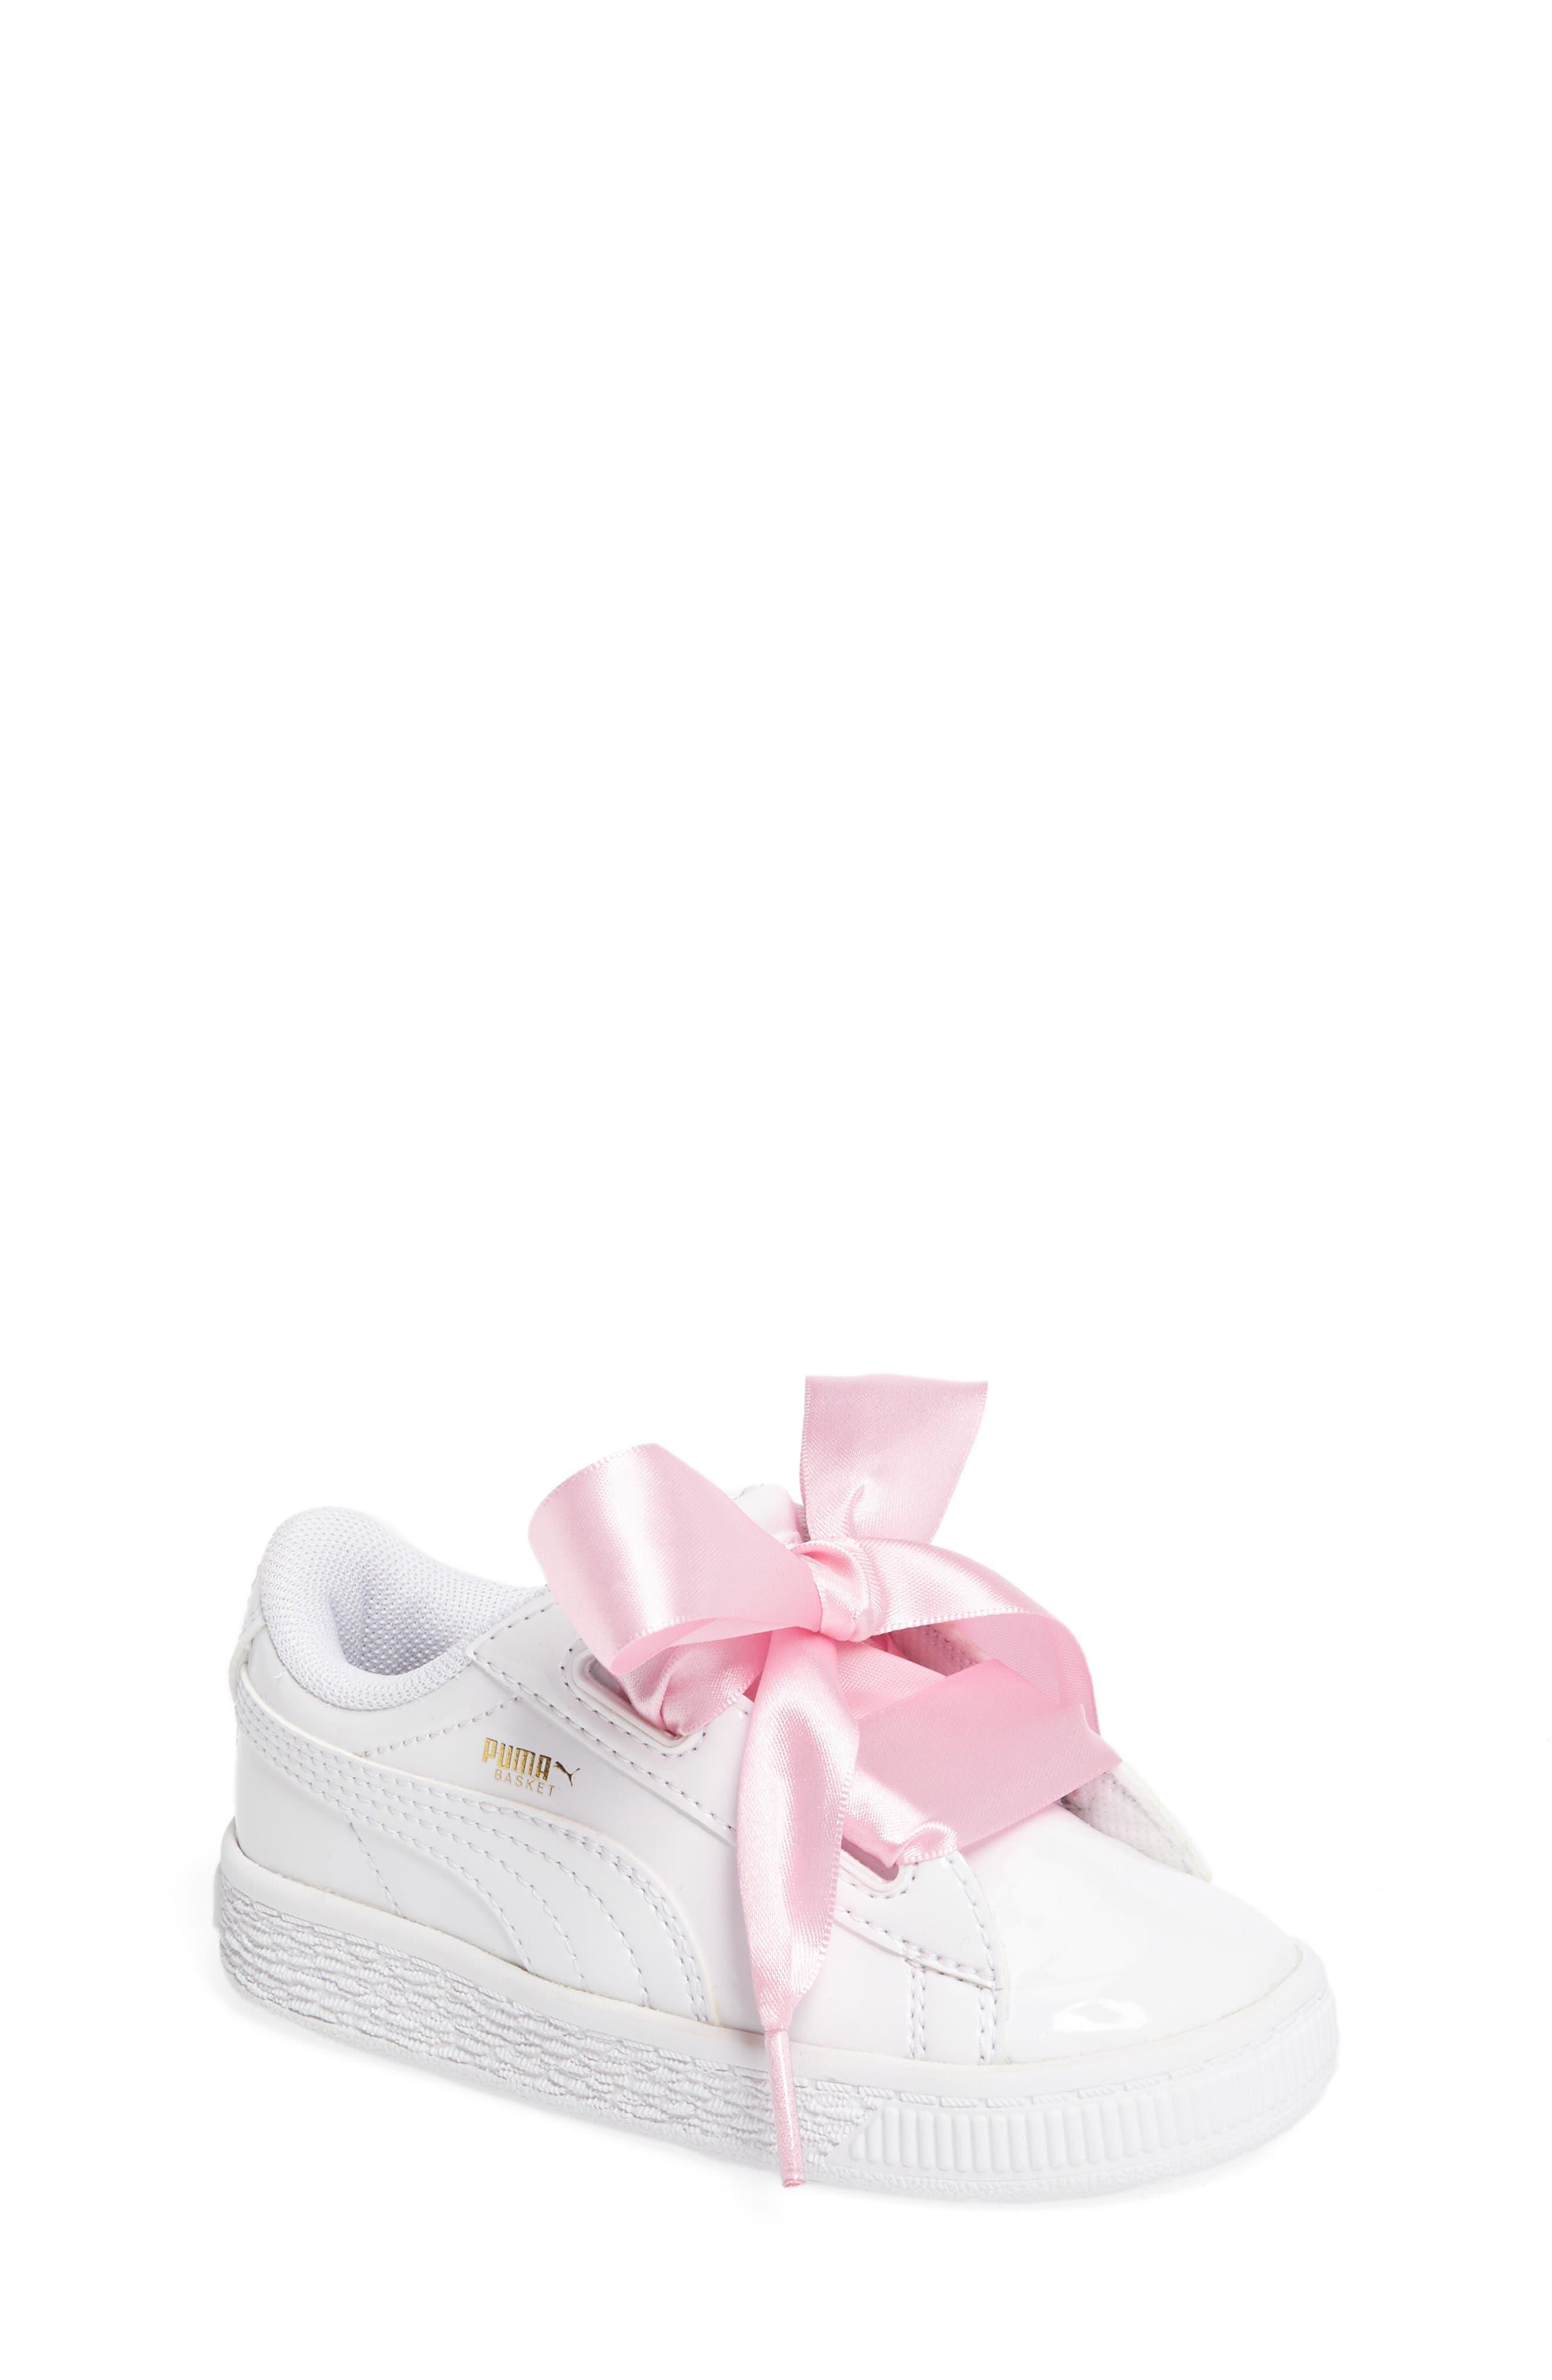 PUMA Basket Heart Sneaker (Walker & Toddler)